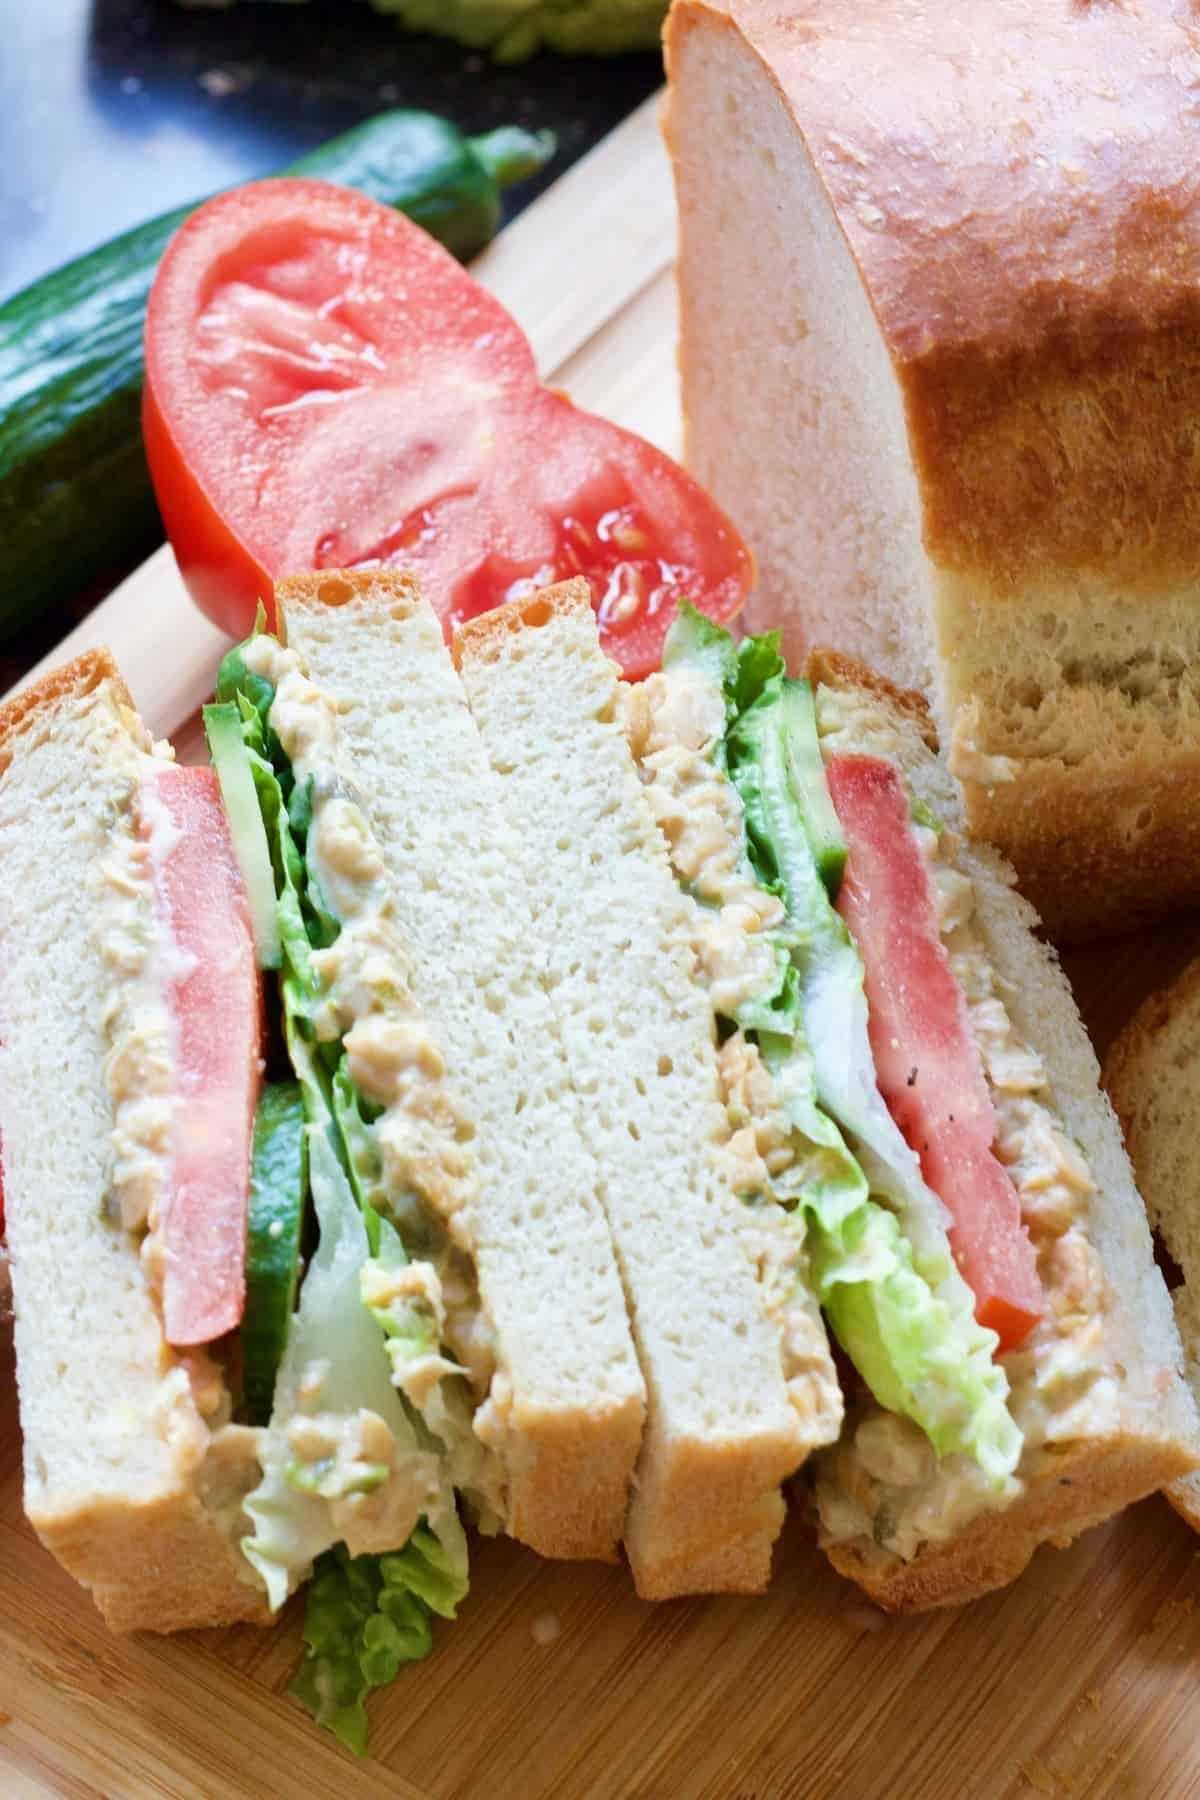 White bread sandwich shown cut in half.